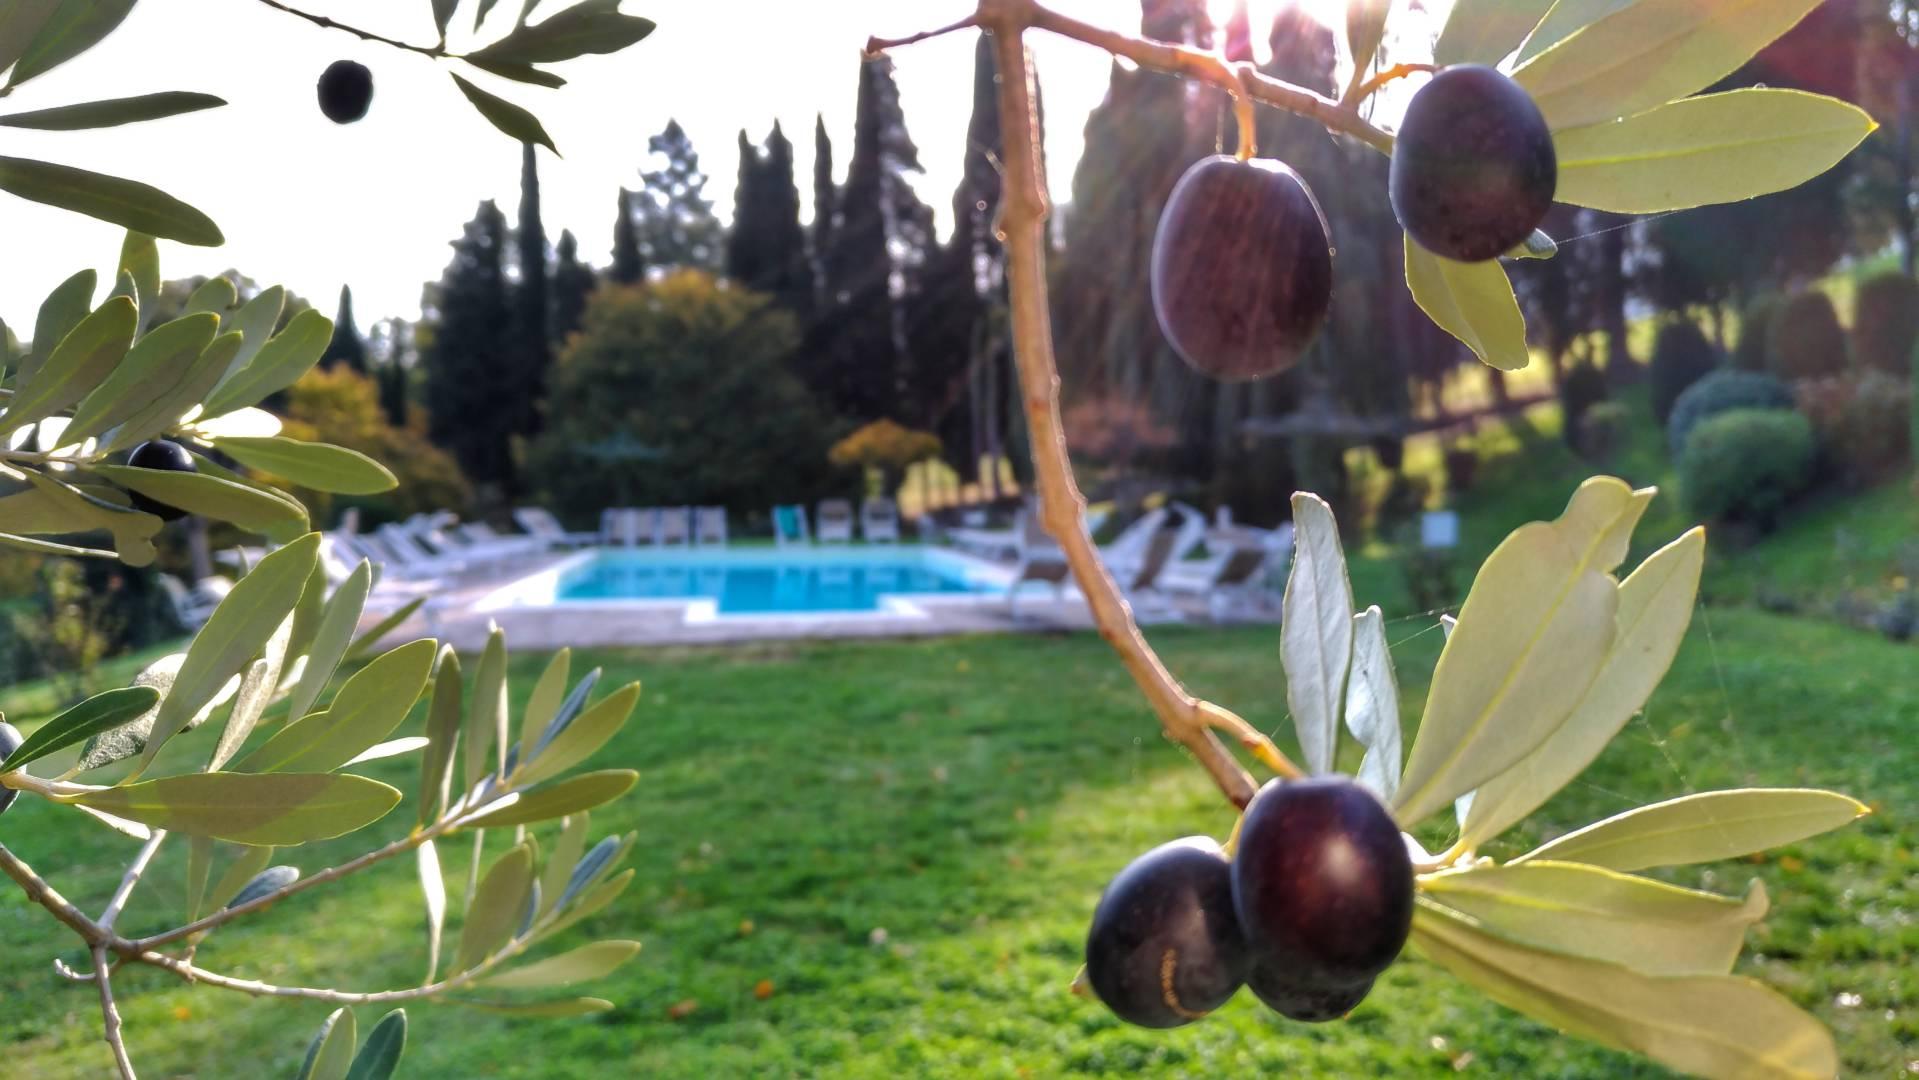 Vacation in Tuscany at Villa Campestri Olive Oil Resort